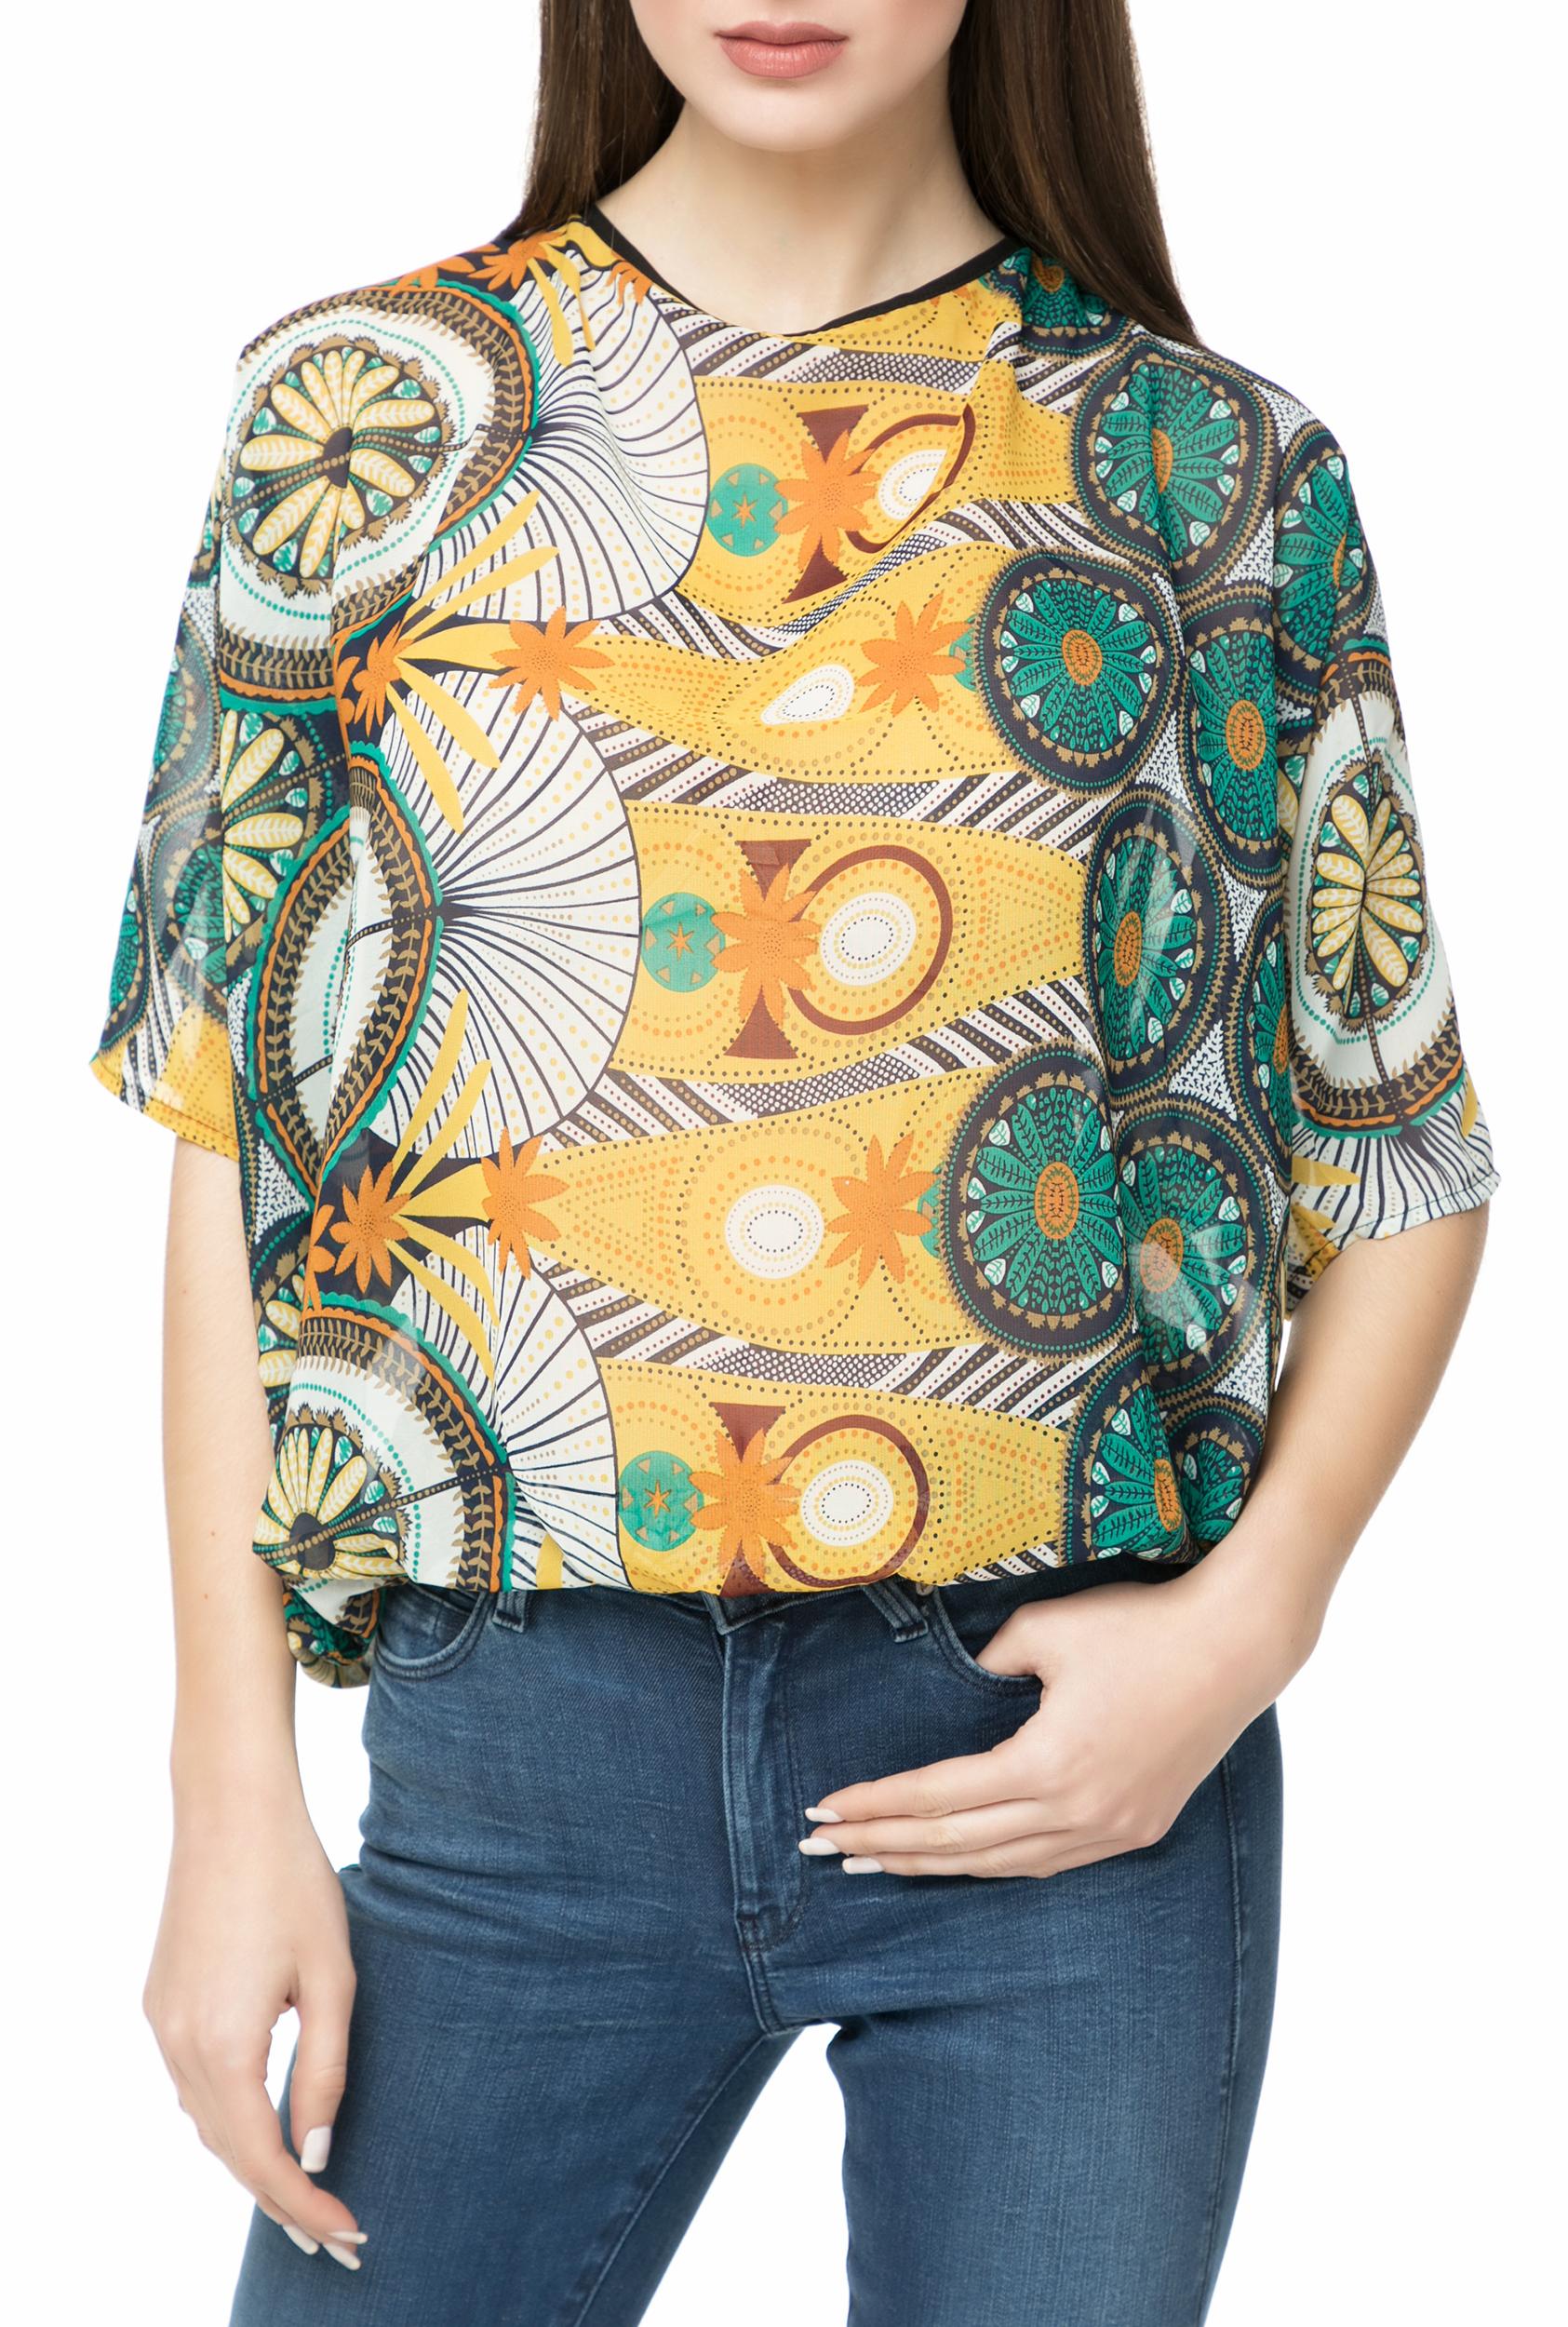 MOLLY BRACKEN - Γυναικείο τοπ MOLLY BRACKEN εμπριμέ γυναικεία ρούχα μπλούζες κοντομάνικες